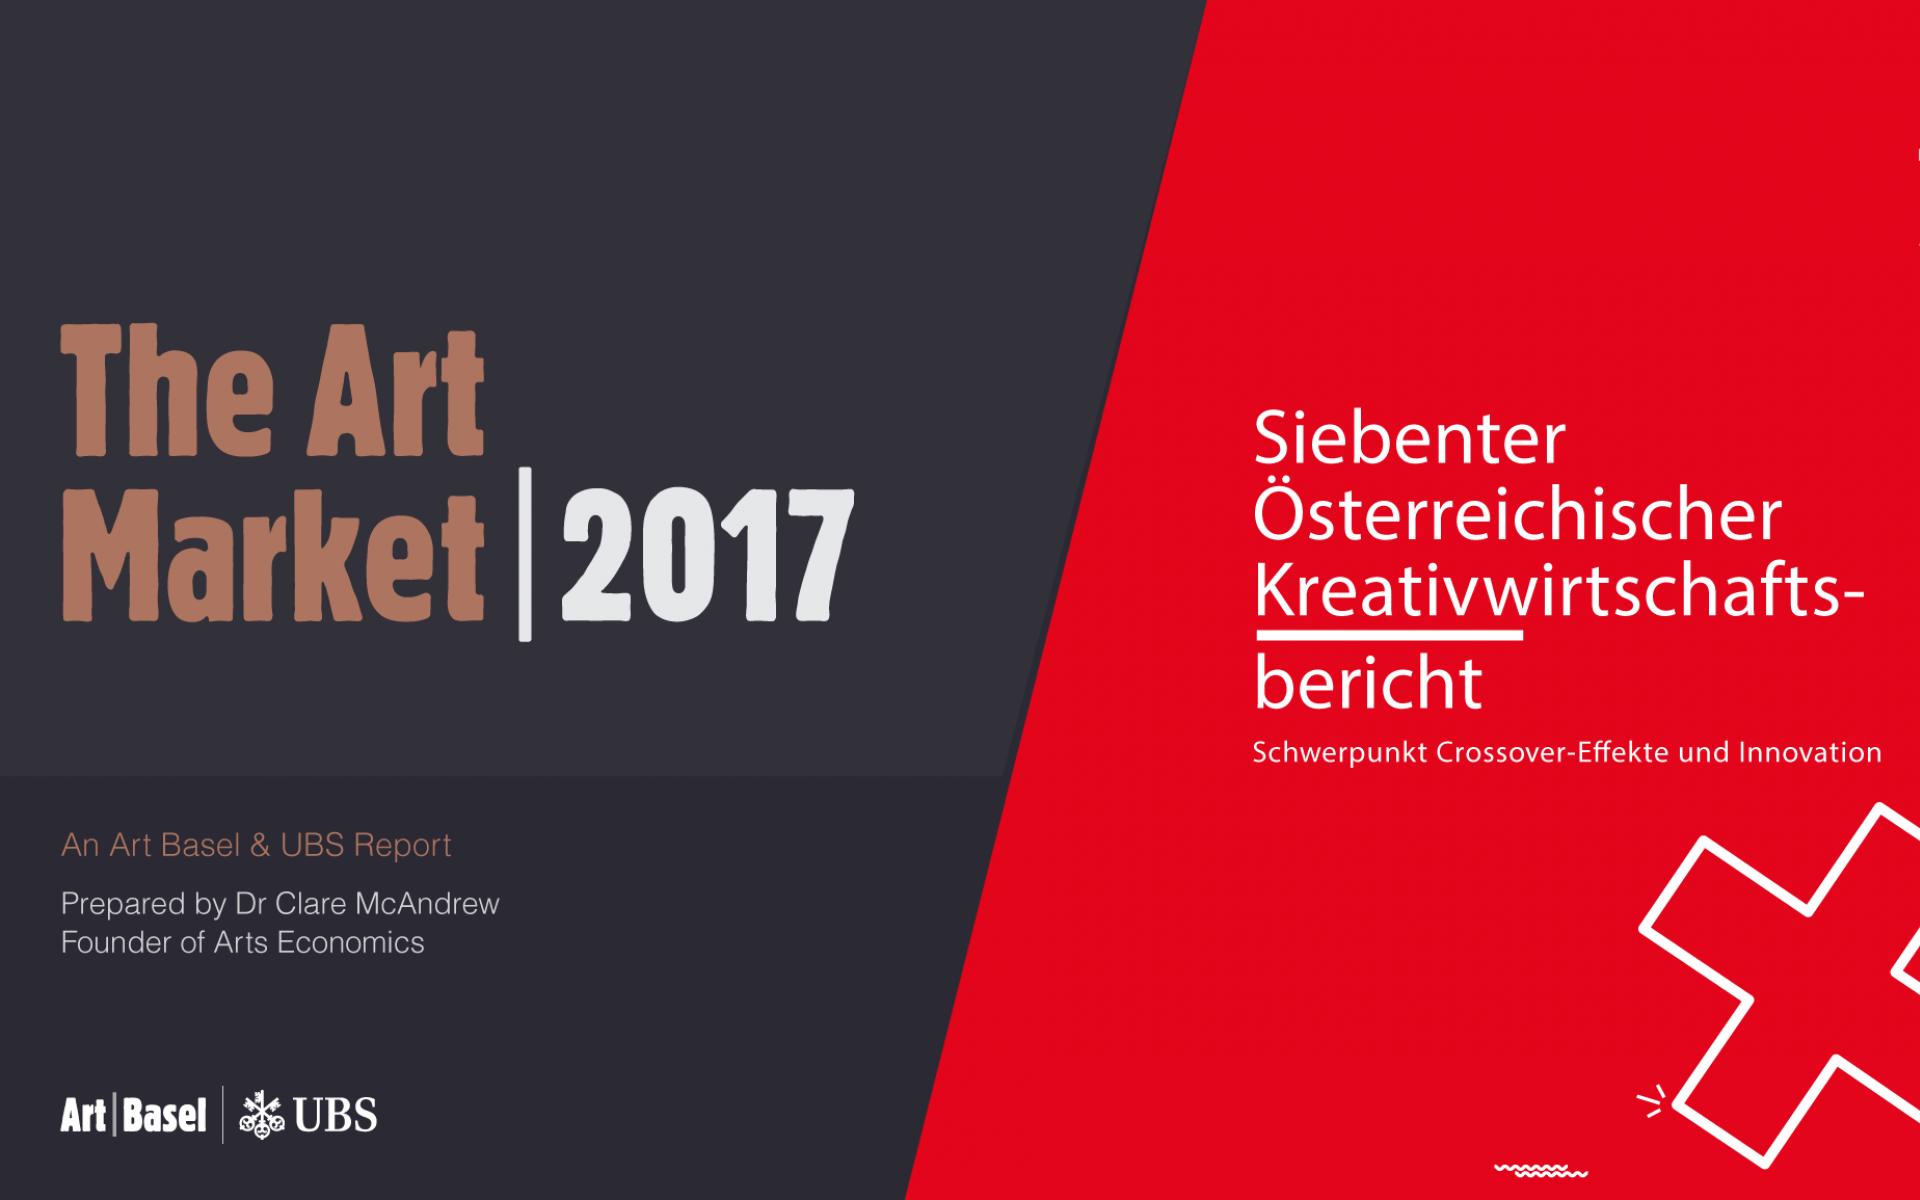 The ART MARKET 2017 | Kreativwirtschaft 2017